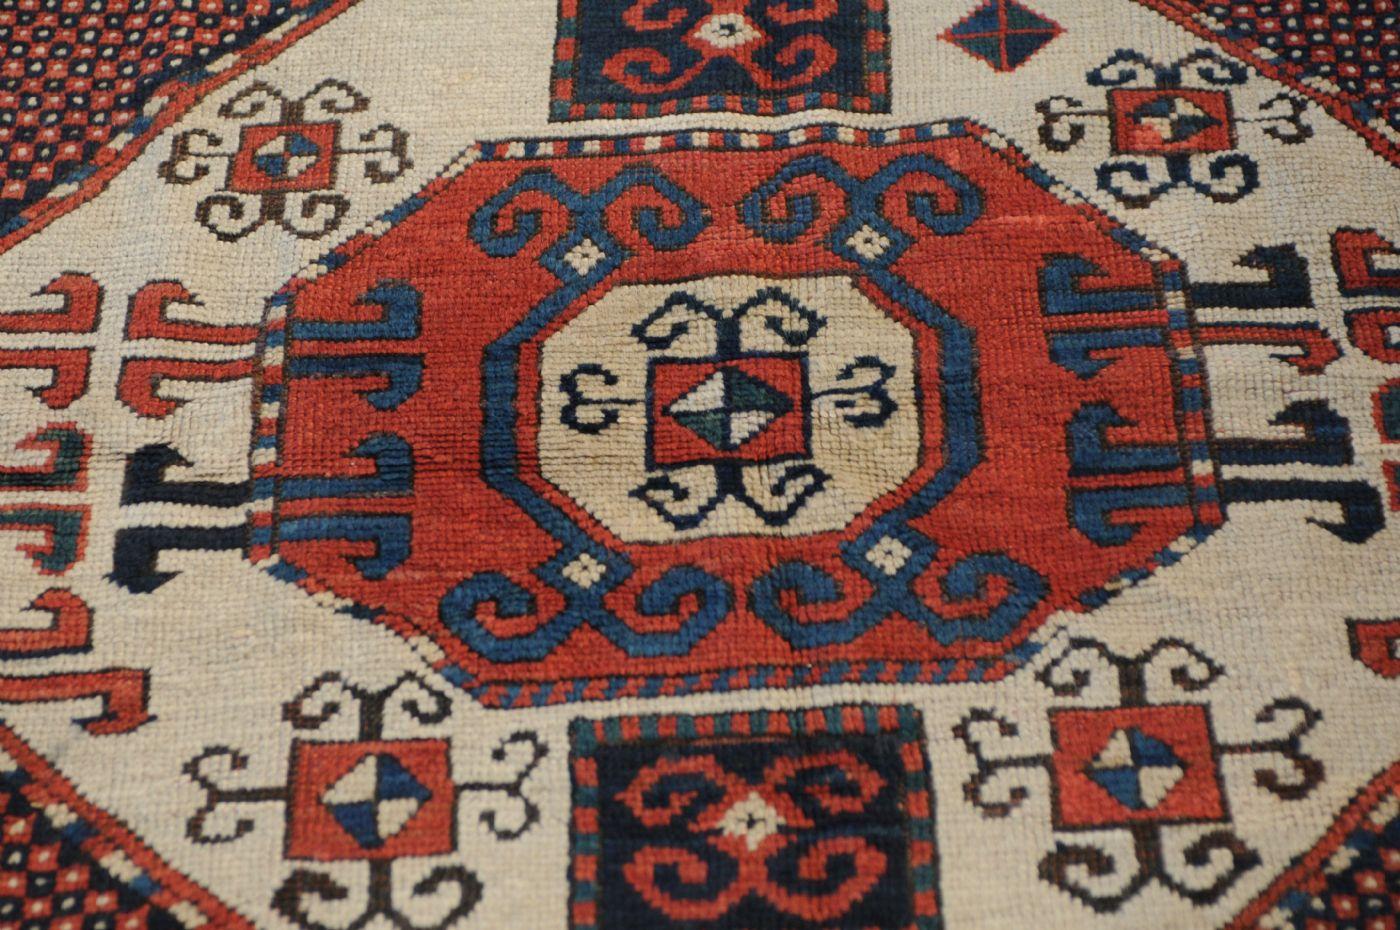 thumb2|Kazakh Karachoph – 19th century – antique piece – approx. 211 x 137 cm